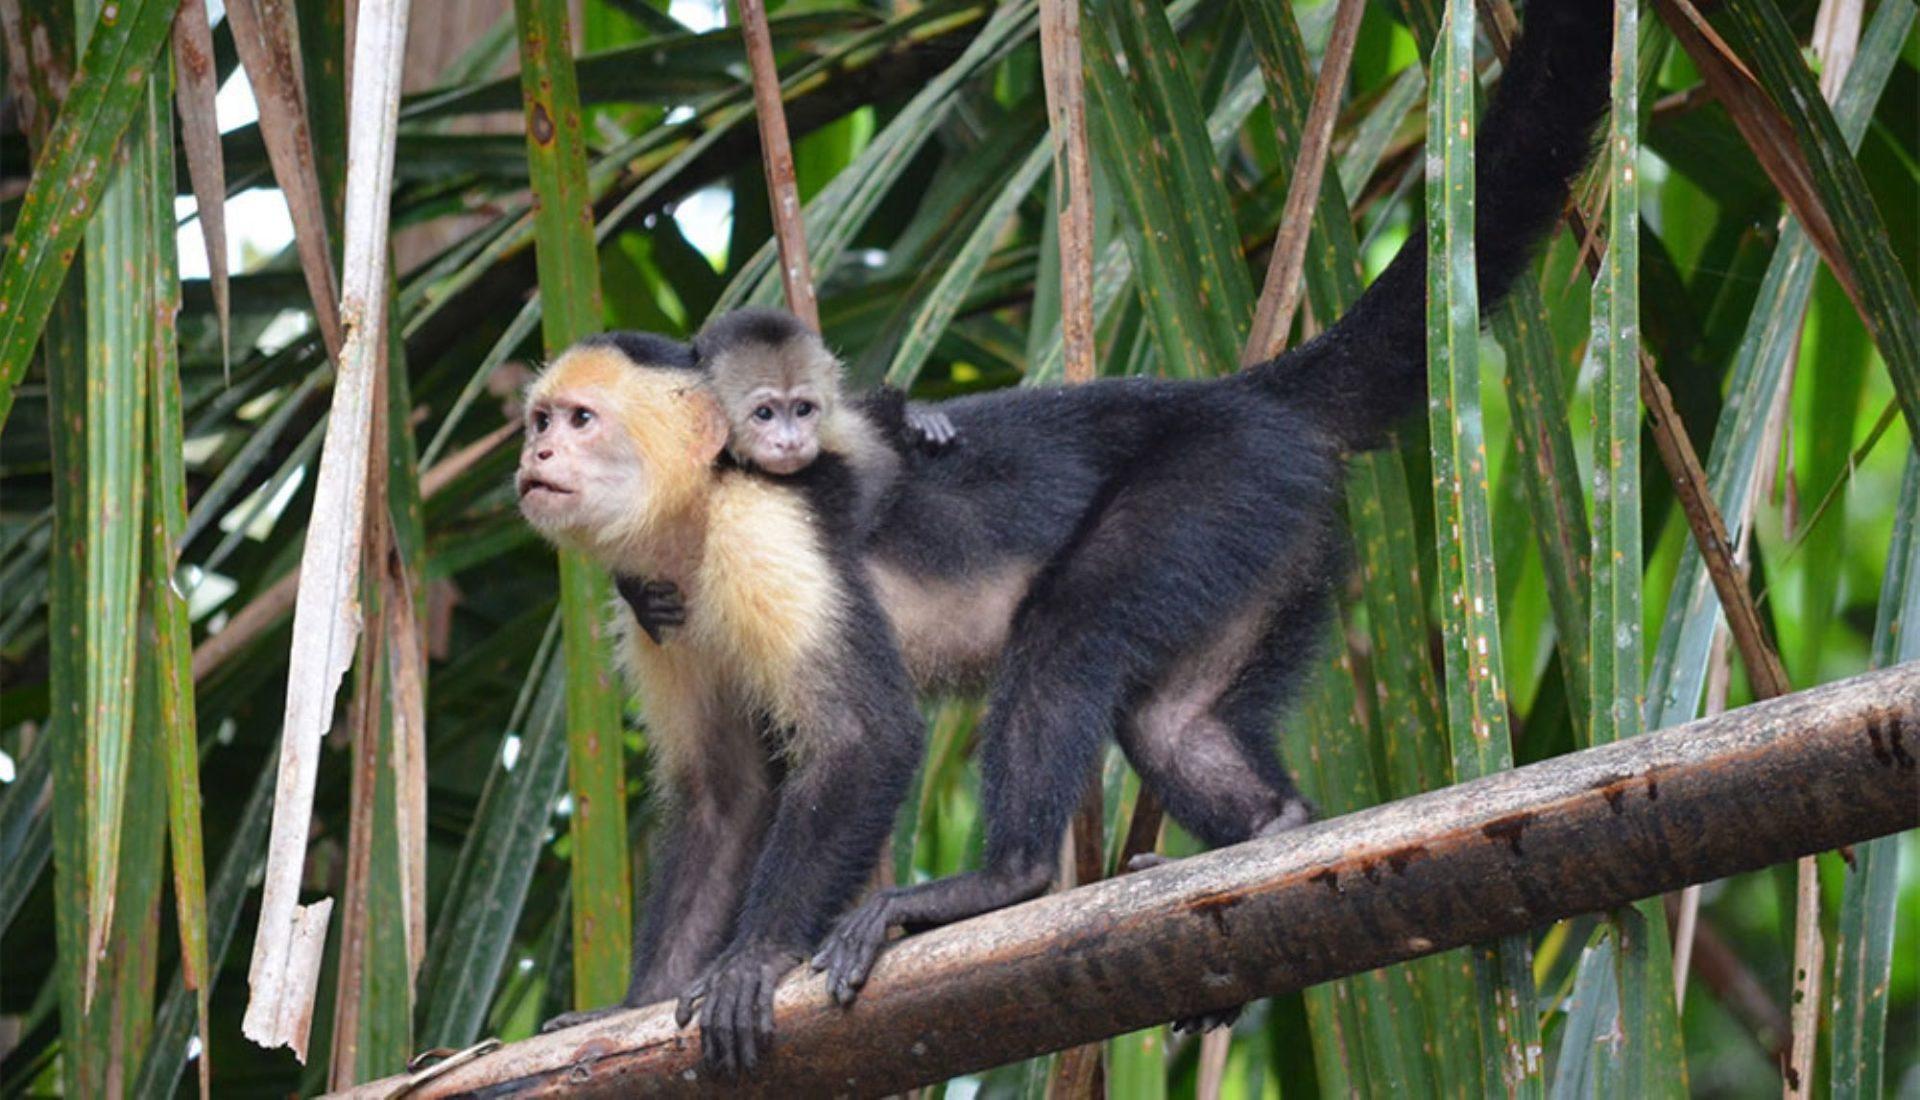 wp-content/uploads/itineraries/Costa-Rica/CRWildlifeDay7.jpg